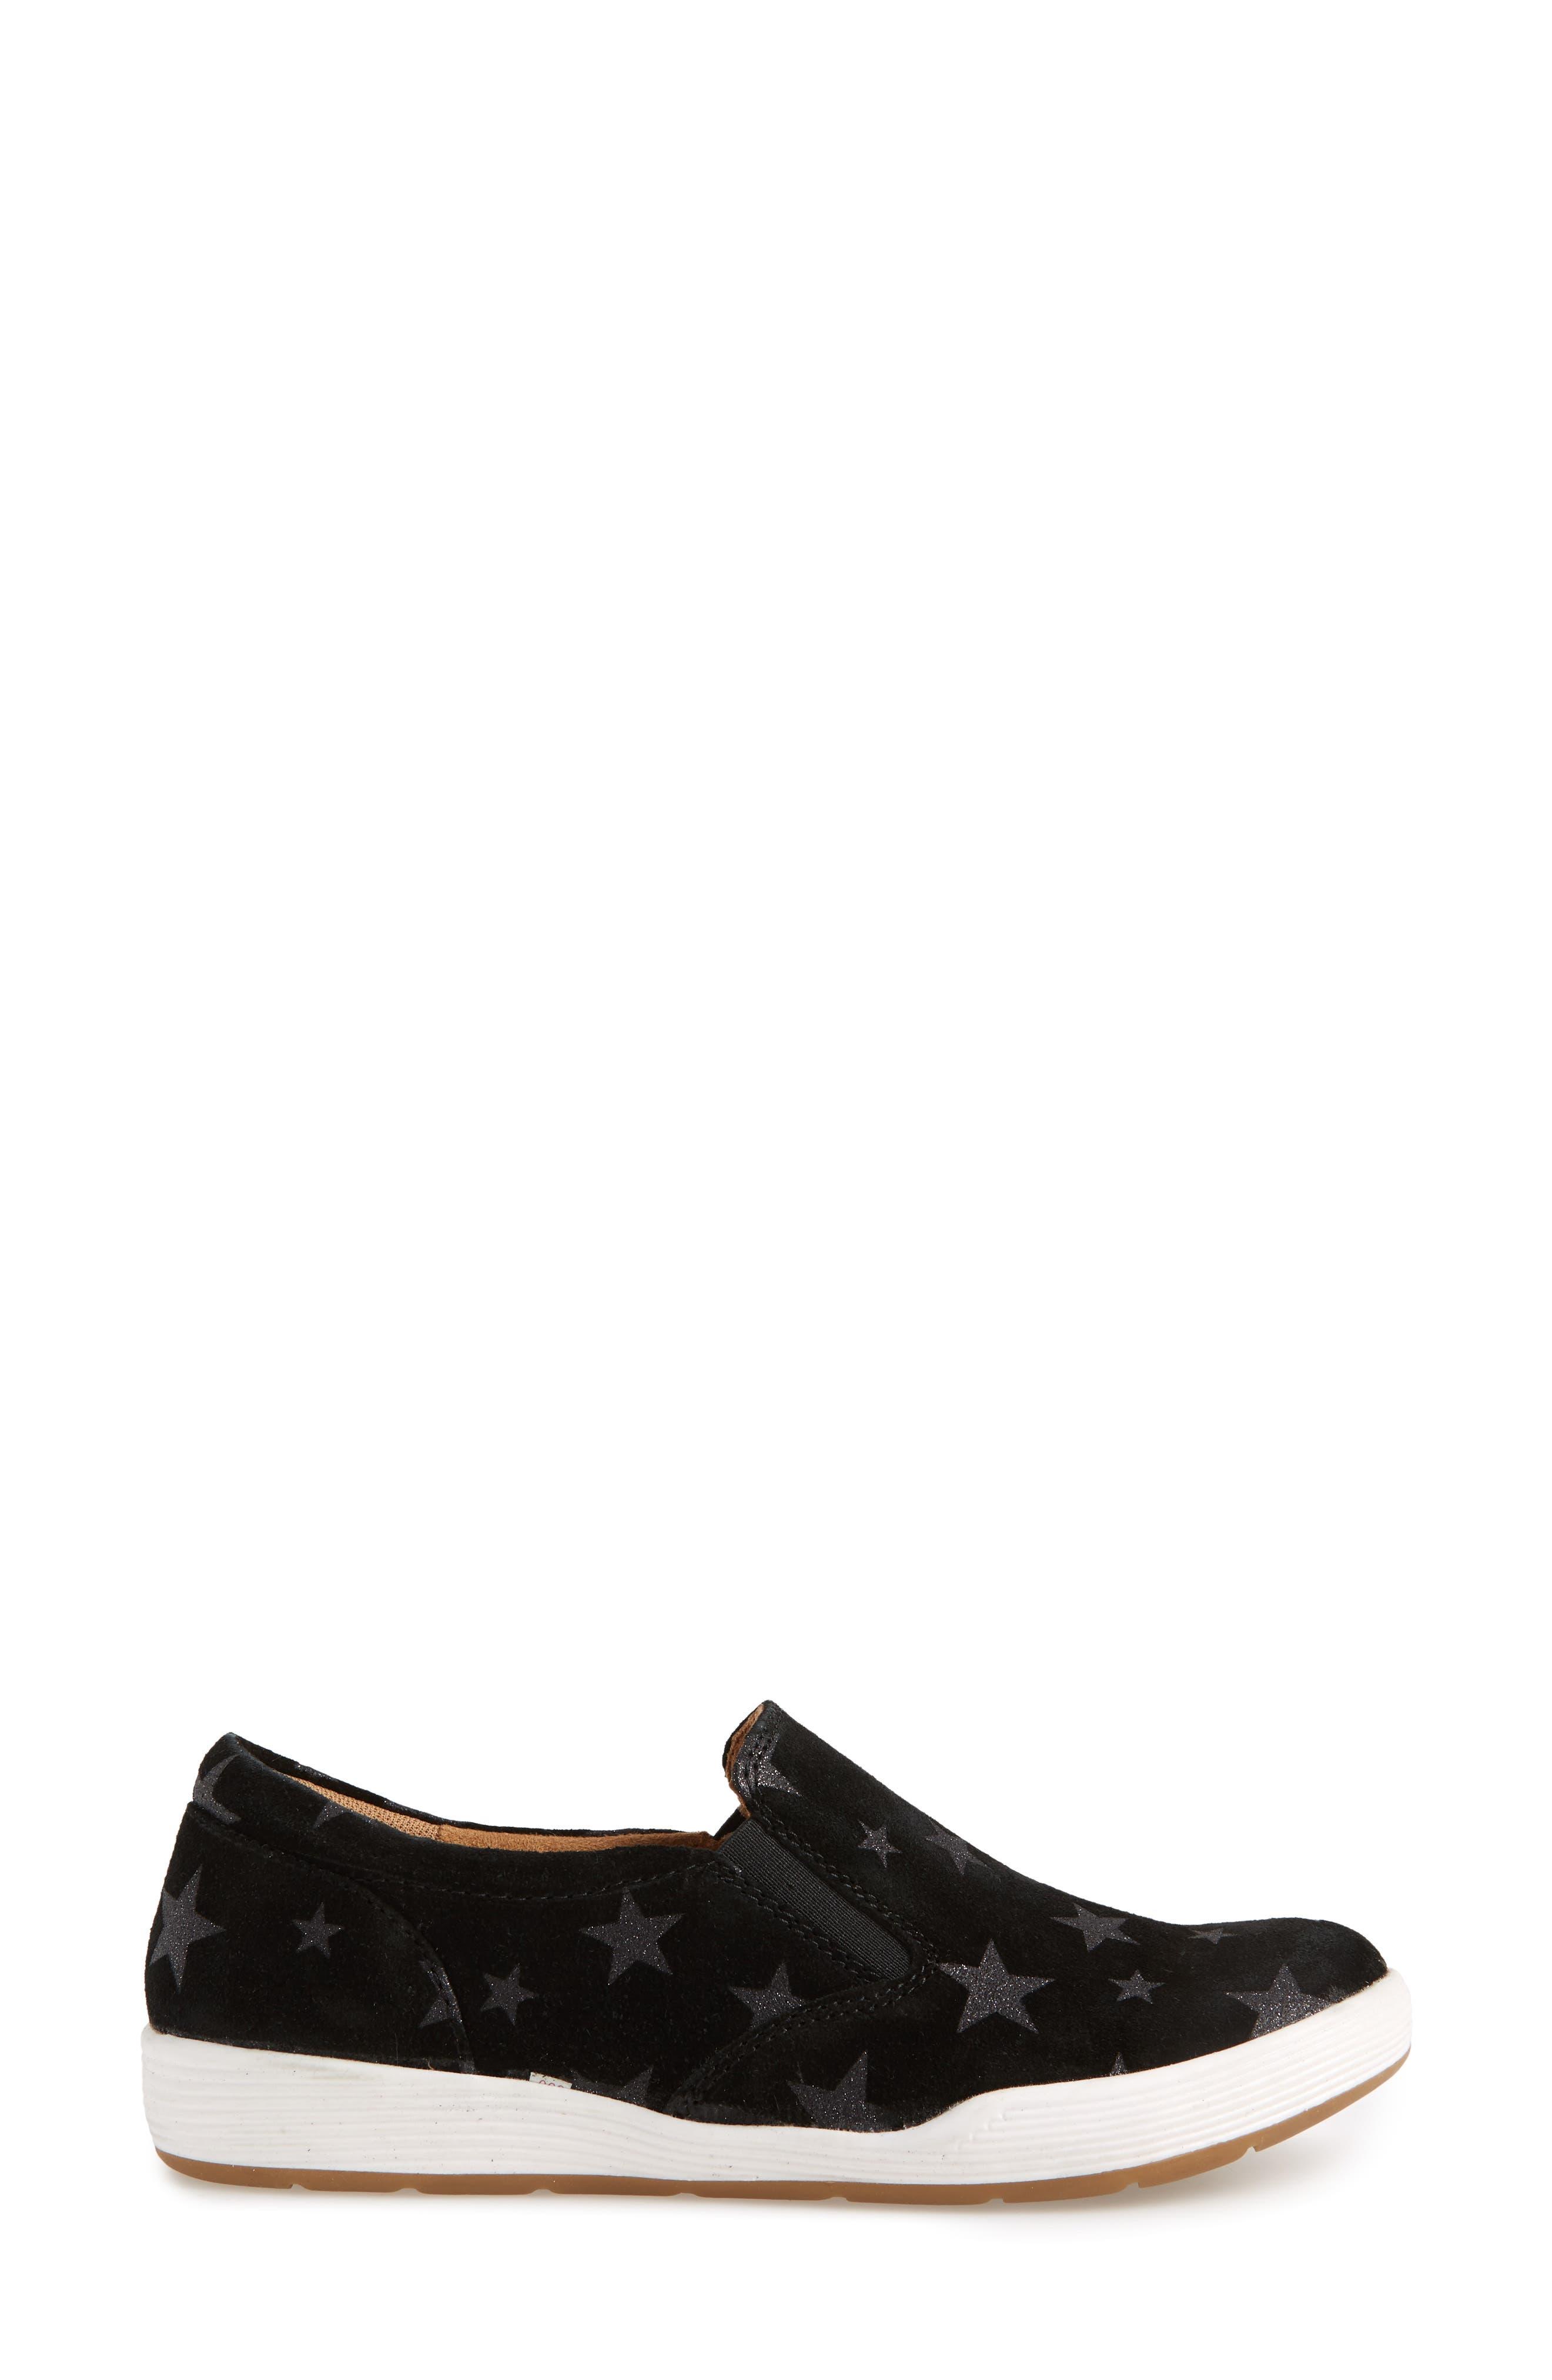 Linette Suede Slip-On Sneaker,                             Alternate thumbnail 3, color,                             BLACK SUEDE